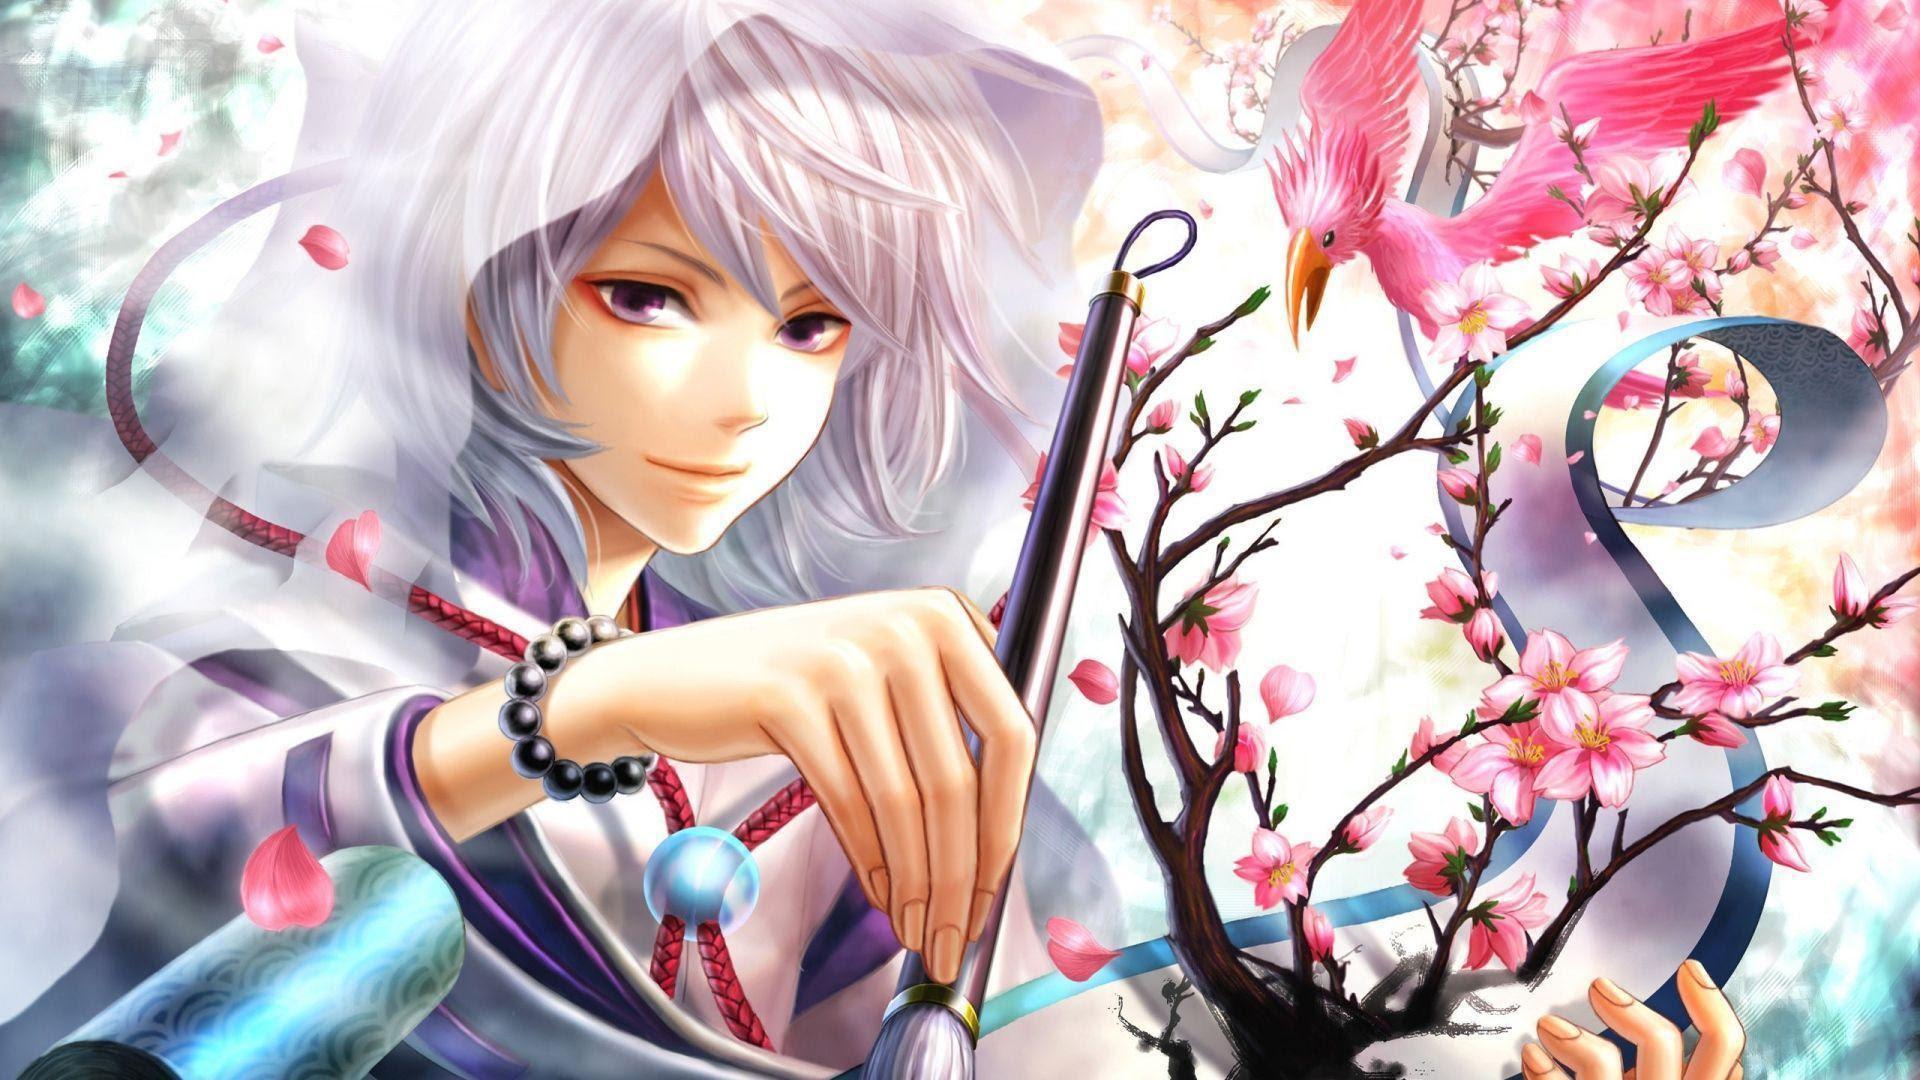 Awesome Hd 1080P Wallpaper Anime Keren Free